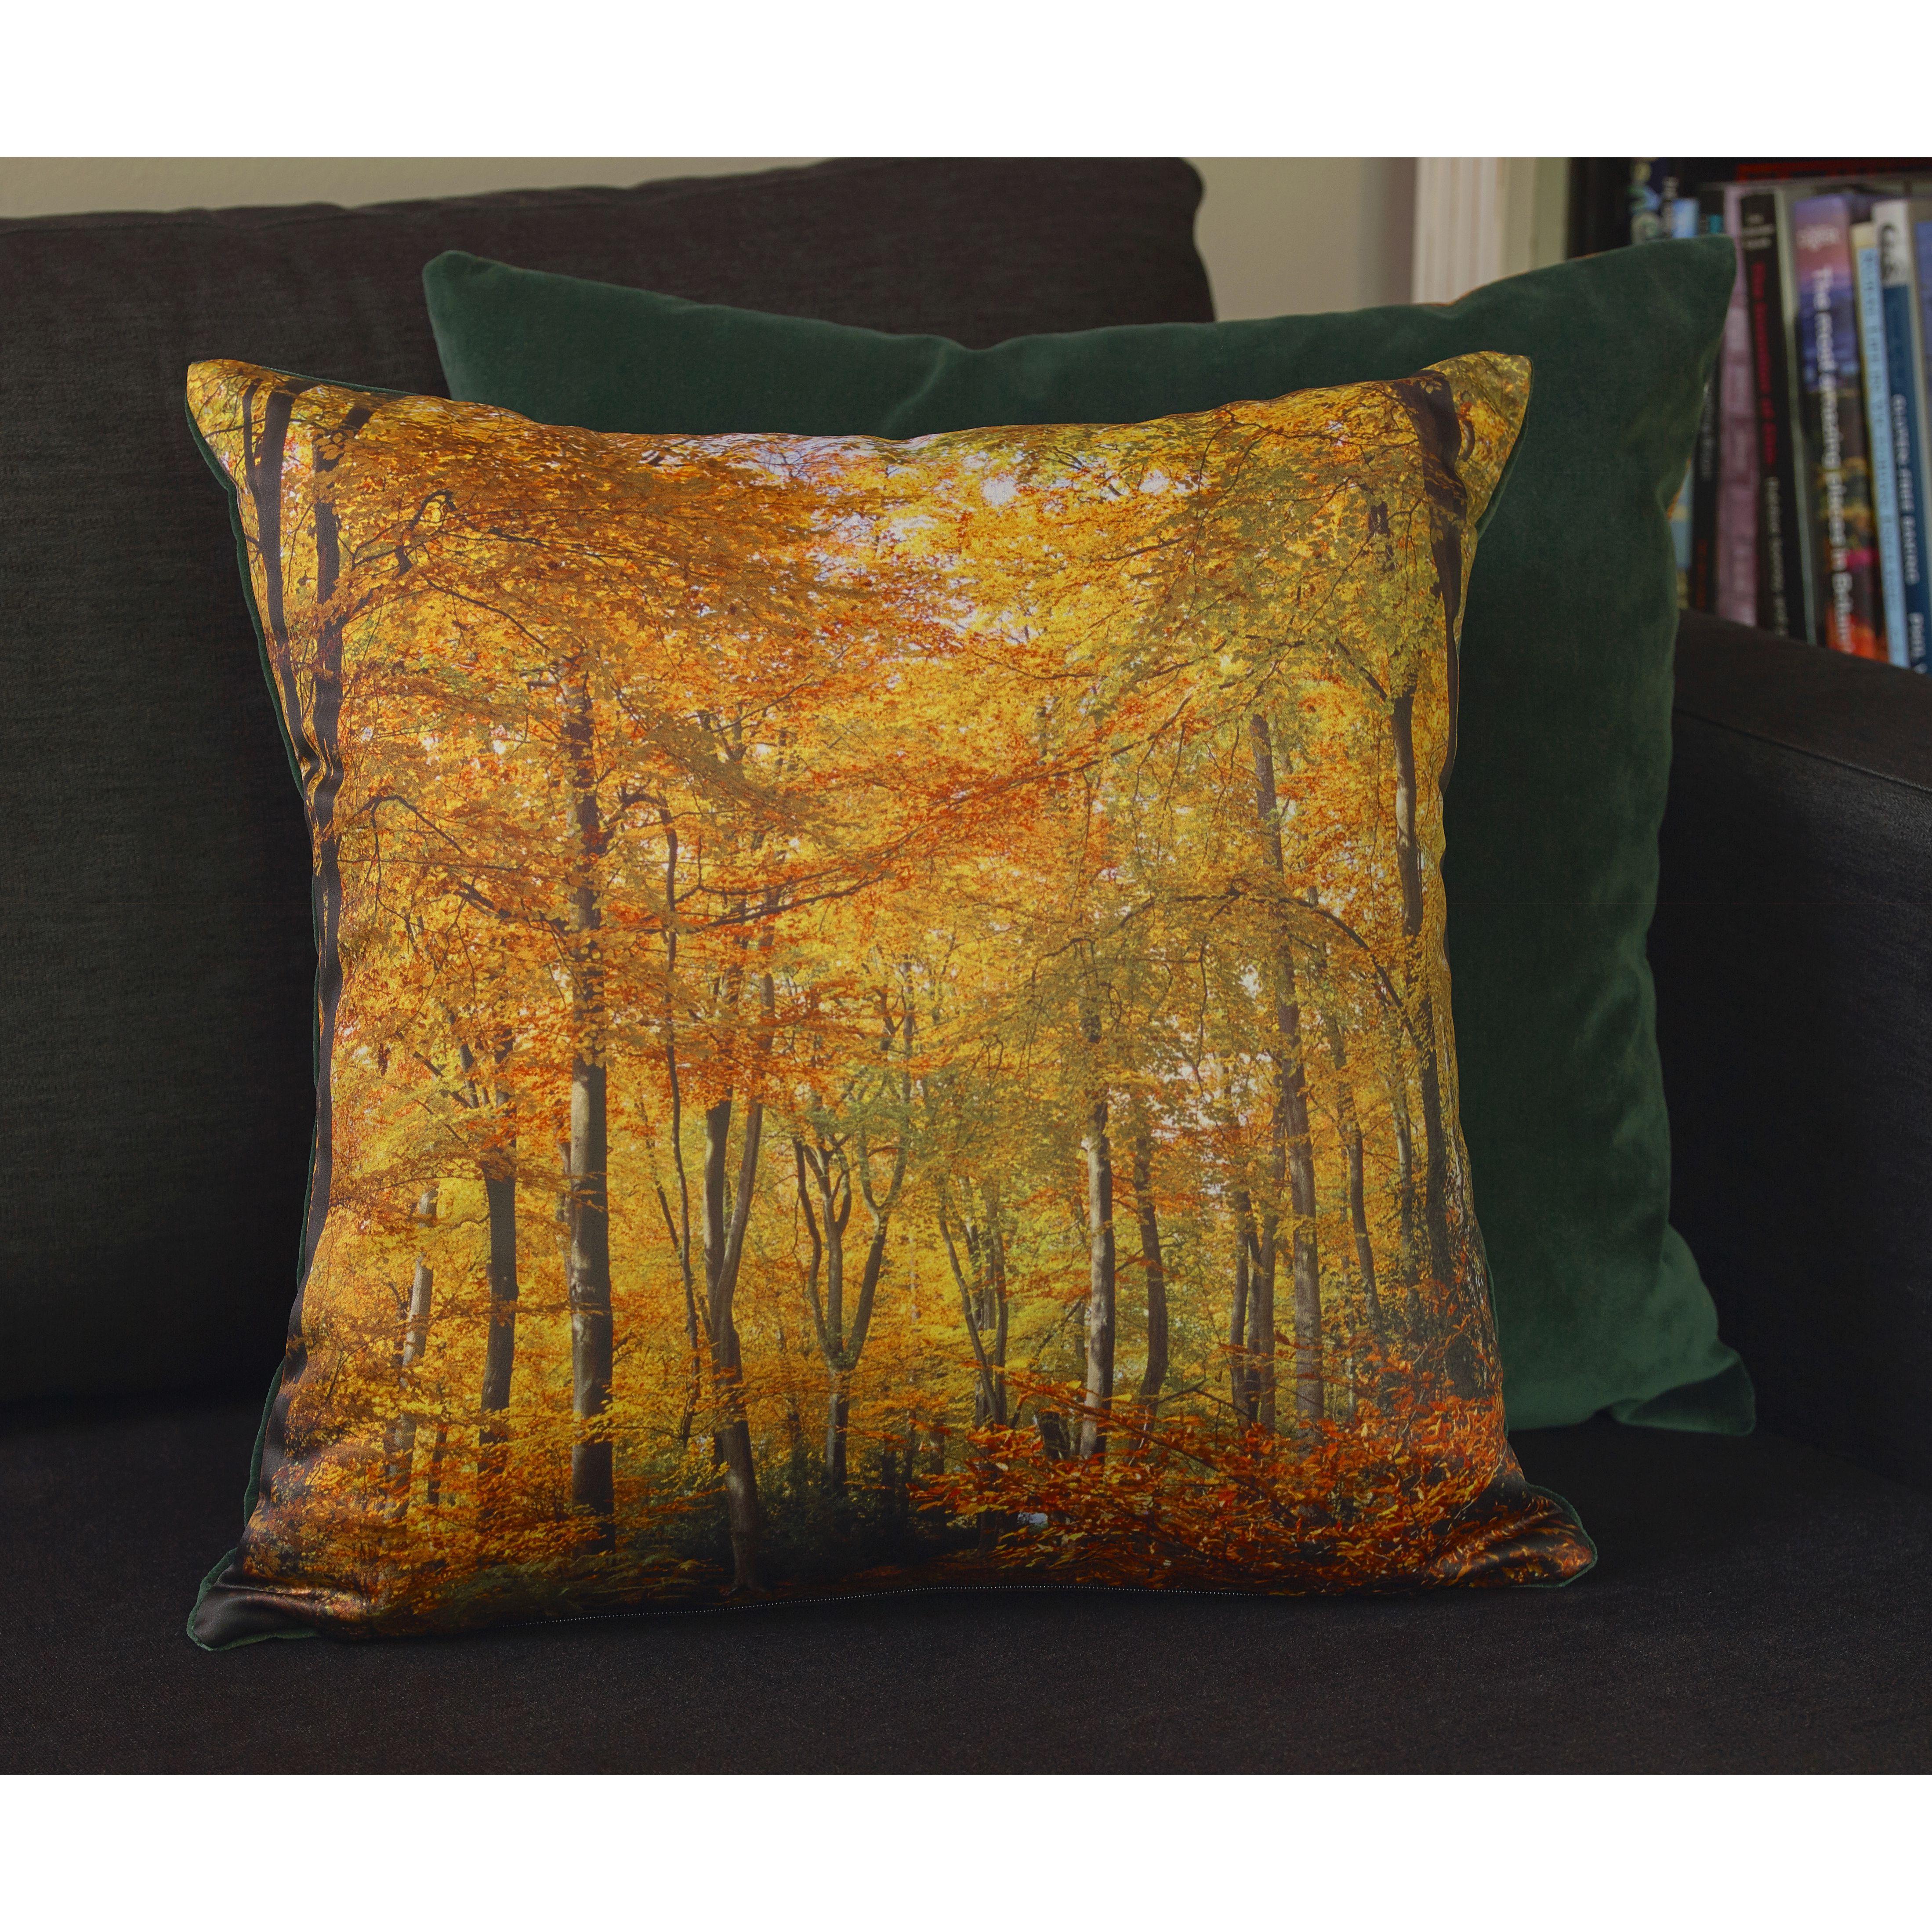 Alice's autumnal walk cushion design